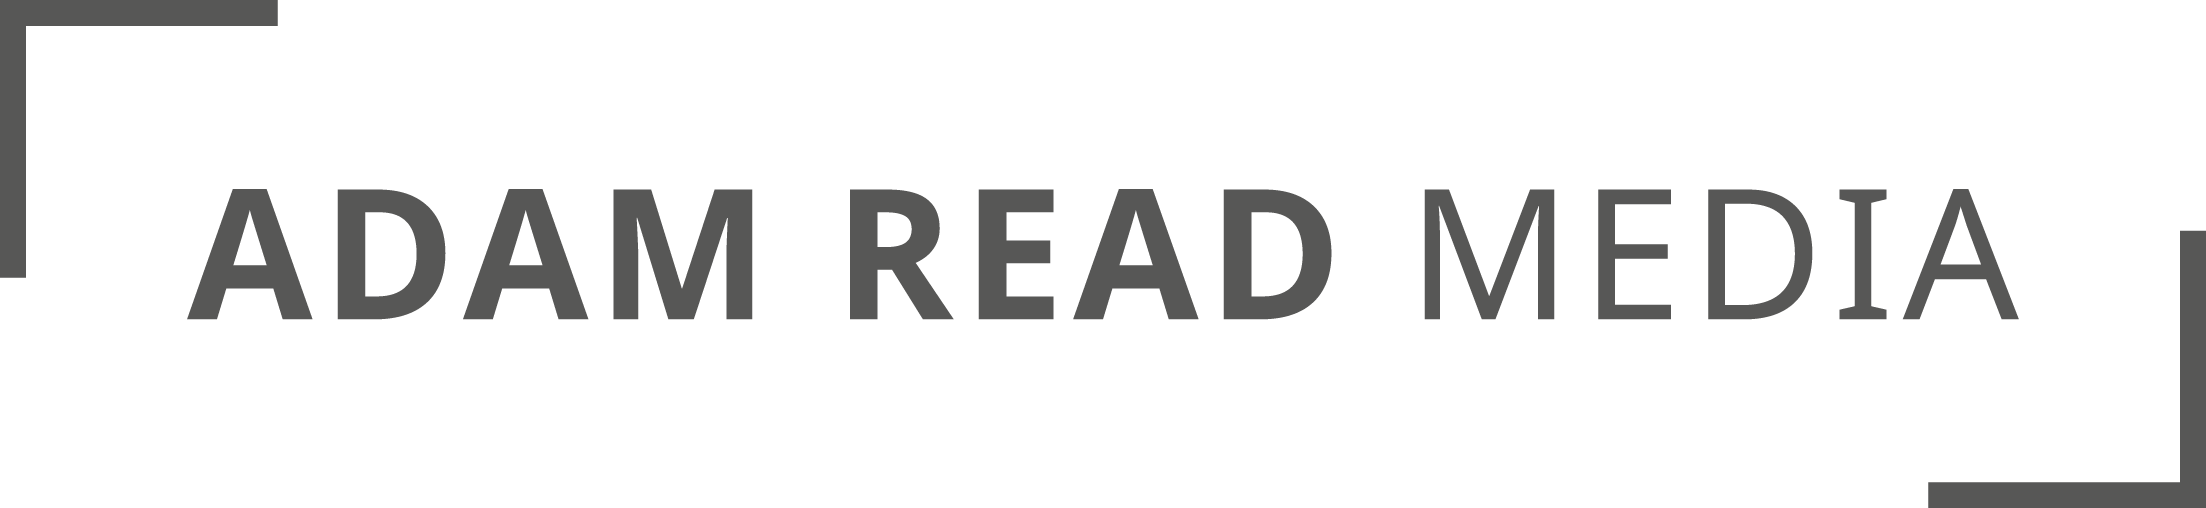 Adam Read Media